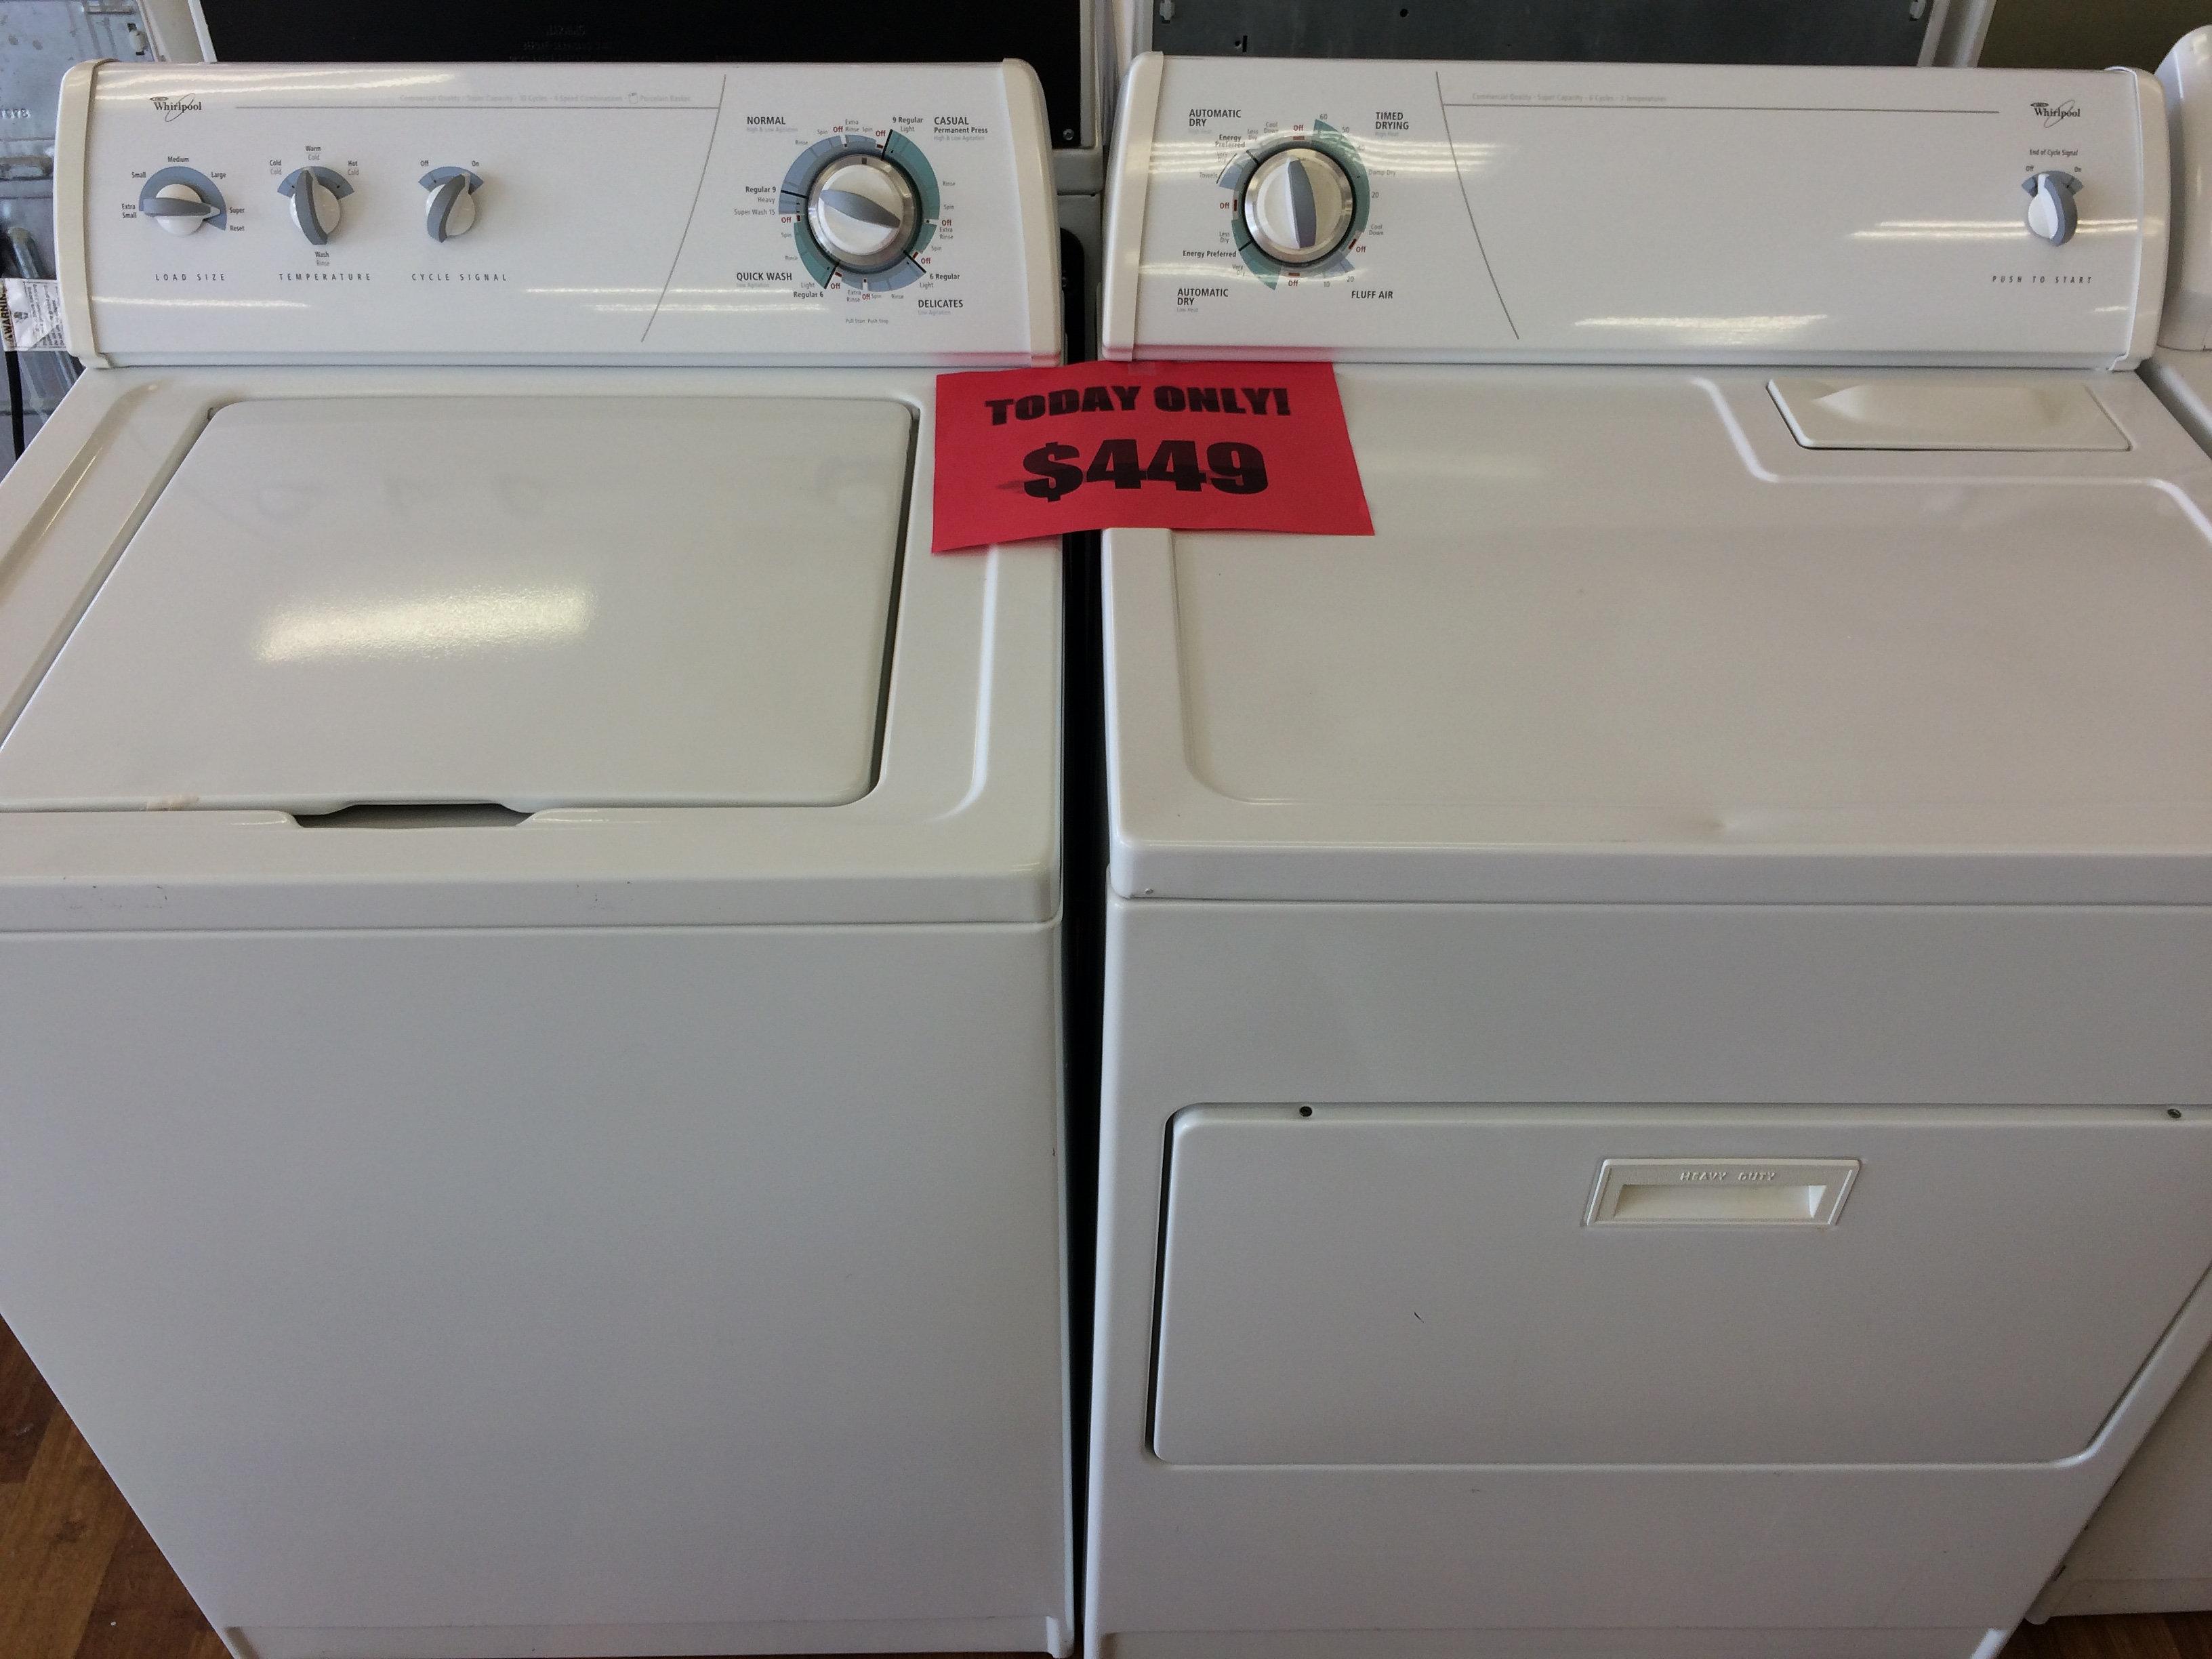 whirlpool top load washerdryer